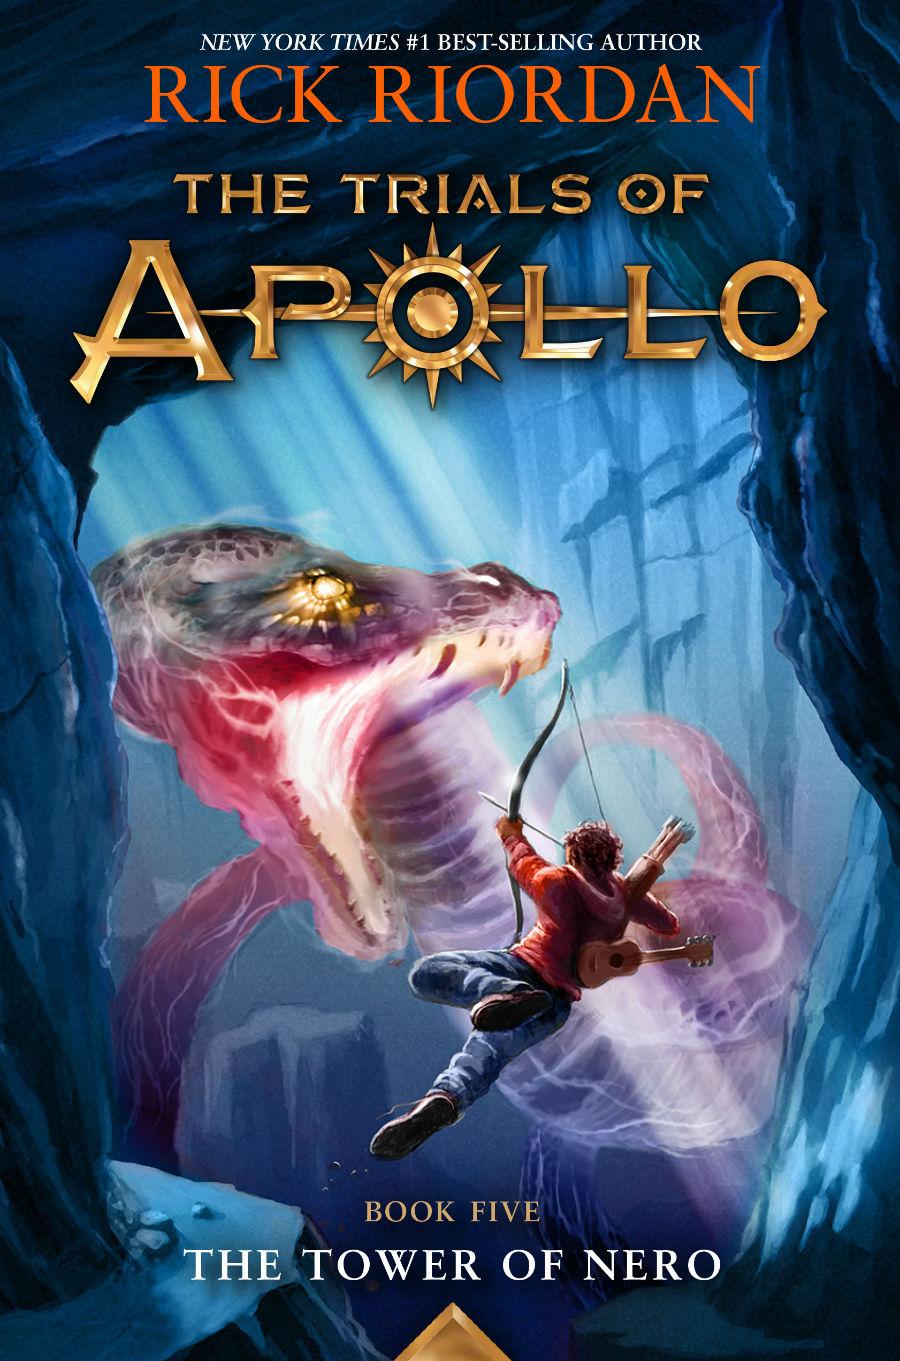 The Tower of Nero (The Trials of Apollo, #5)